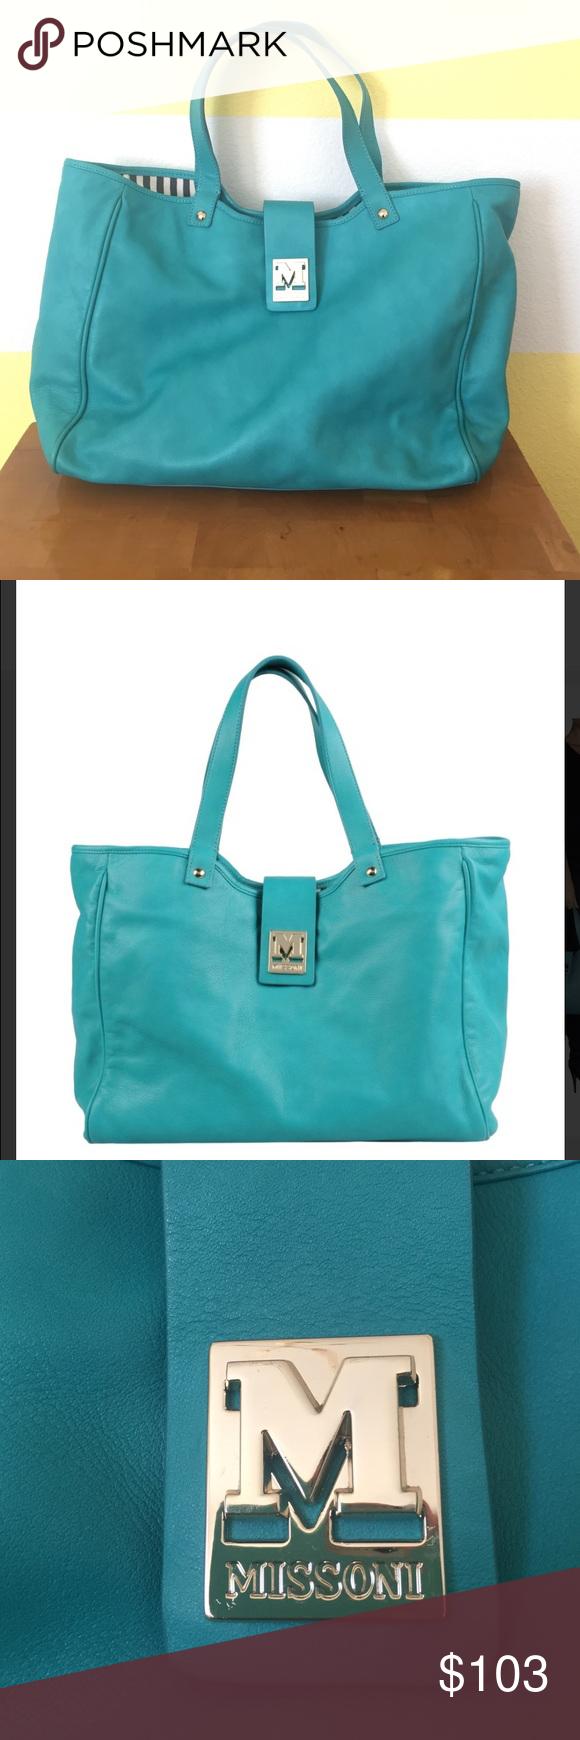 ef531d157e M Missoni Turquoise Leather Tote Bag M Missoni Turquoise Leather Tote Bag.  Soft turquoise leather